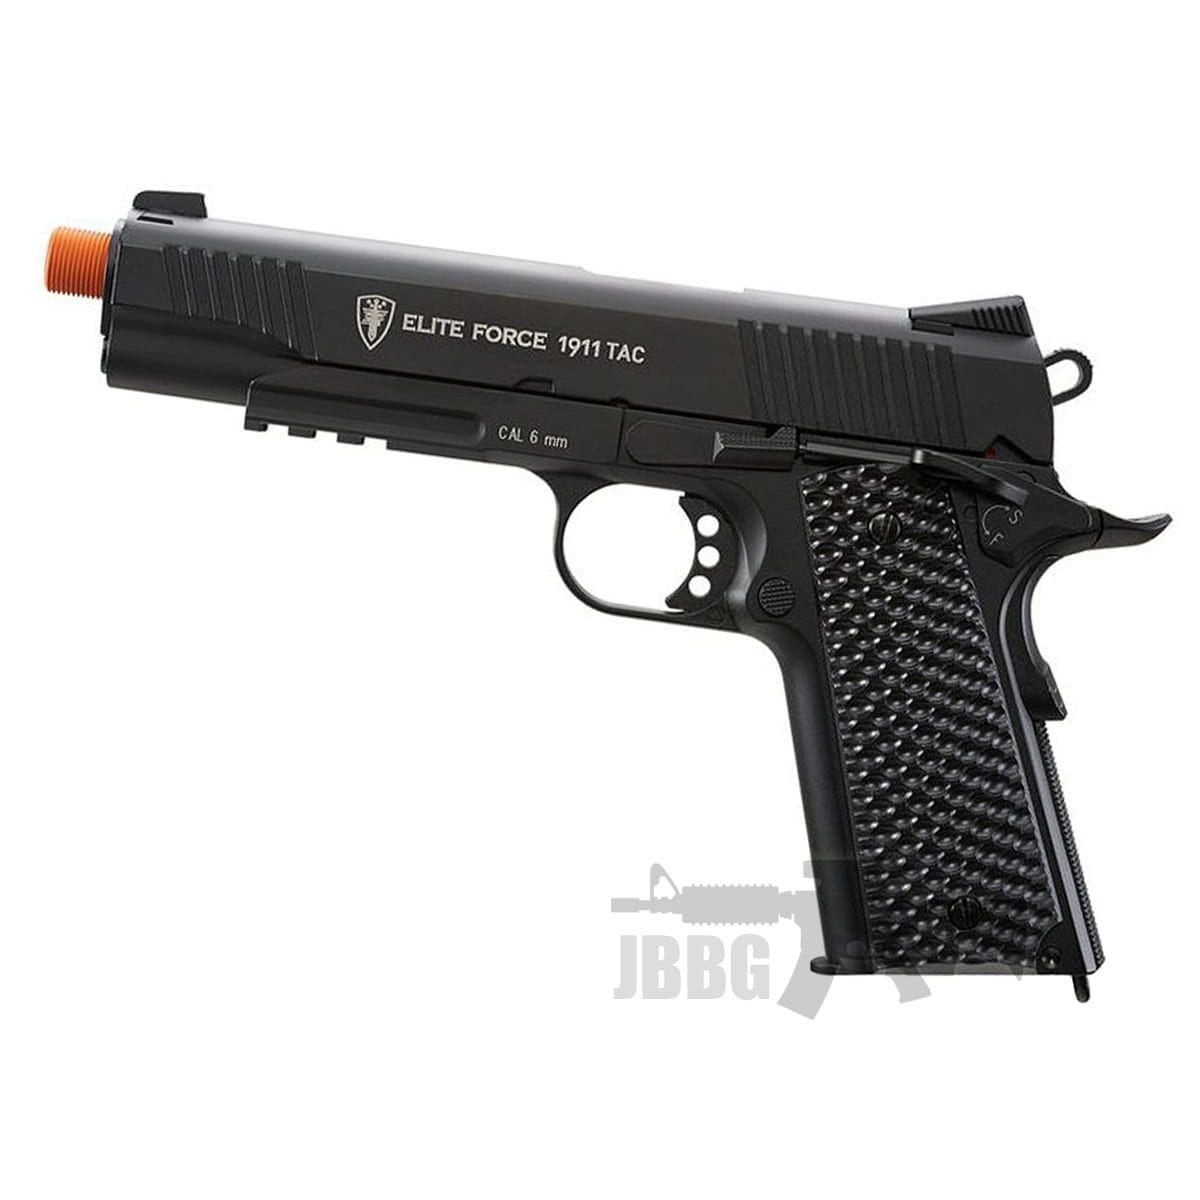 tac 1911 pistol